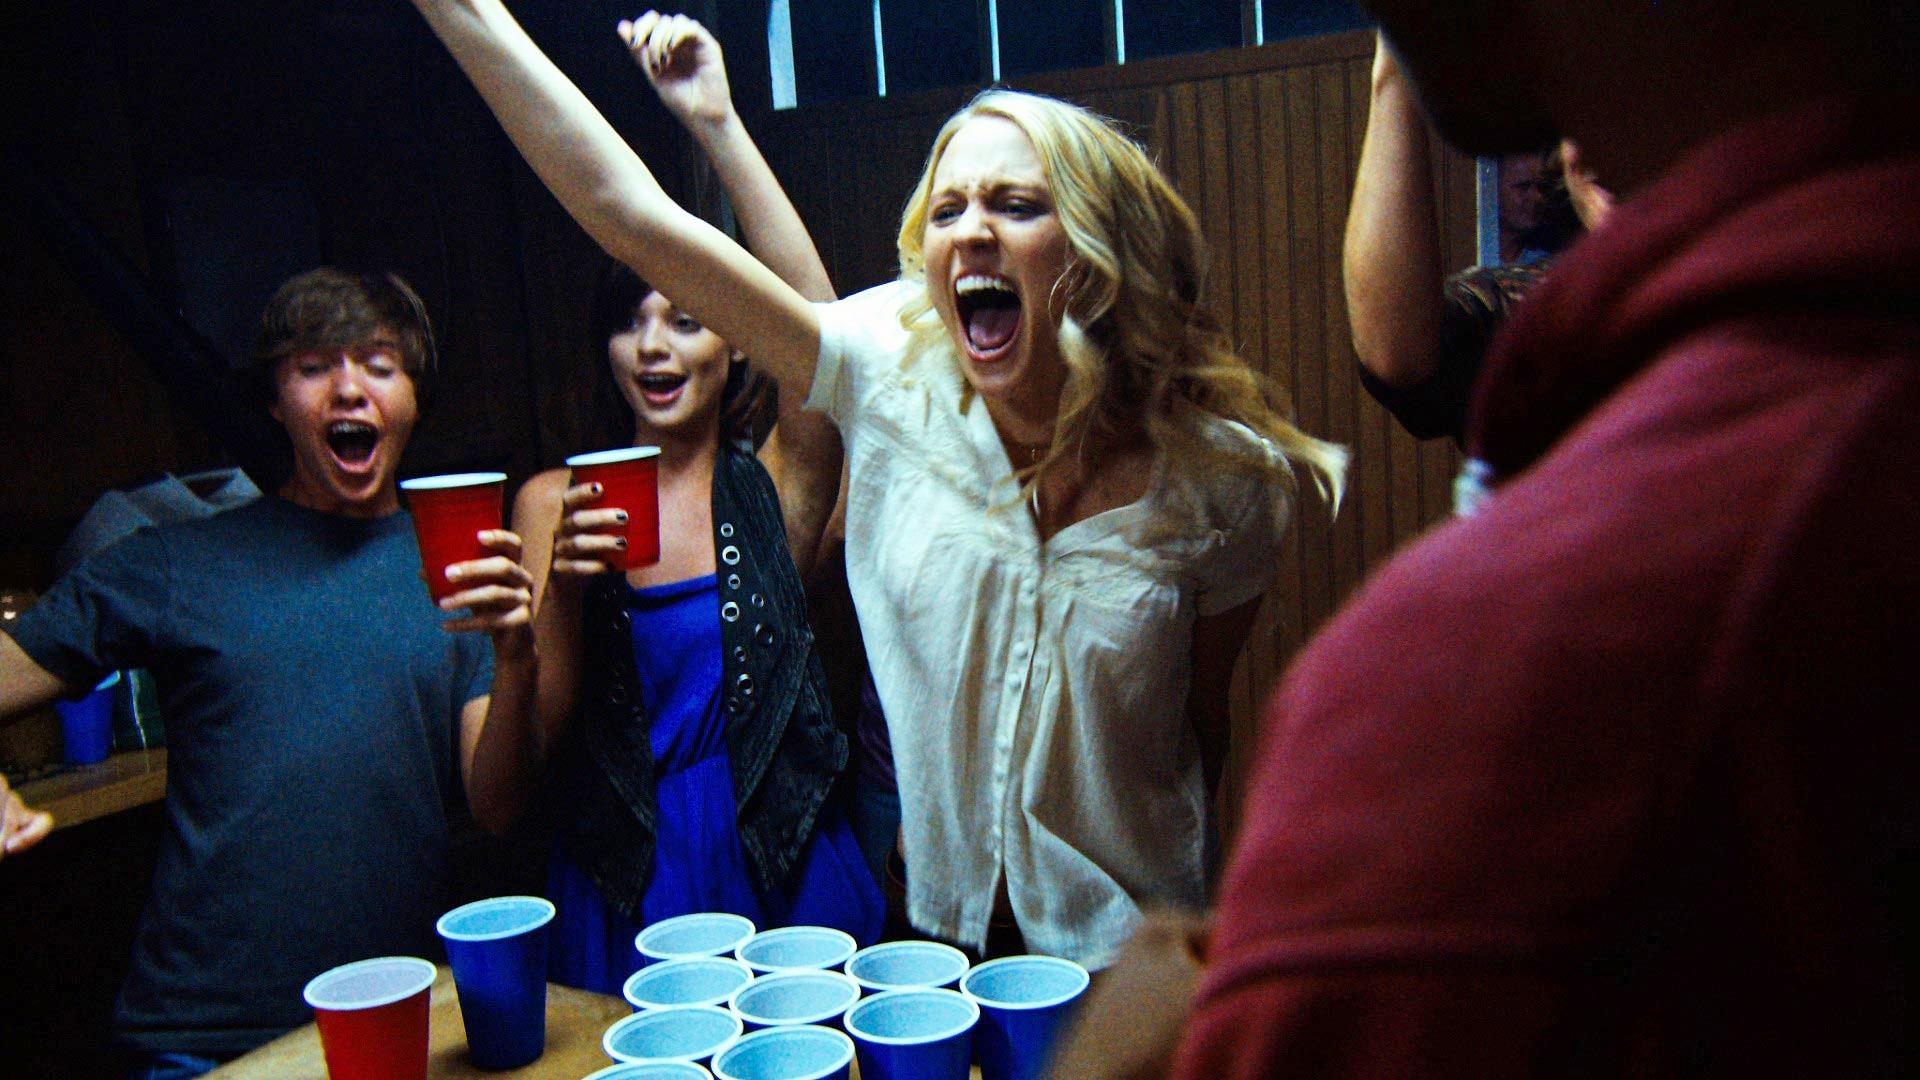 teen-party-trailer